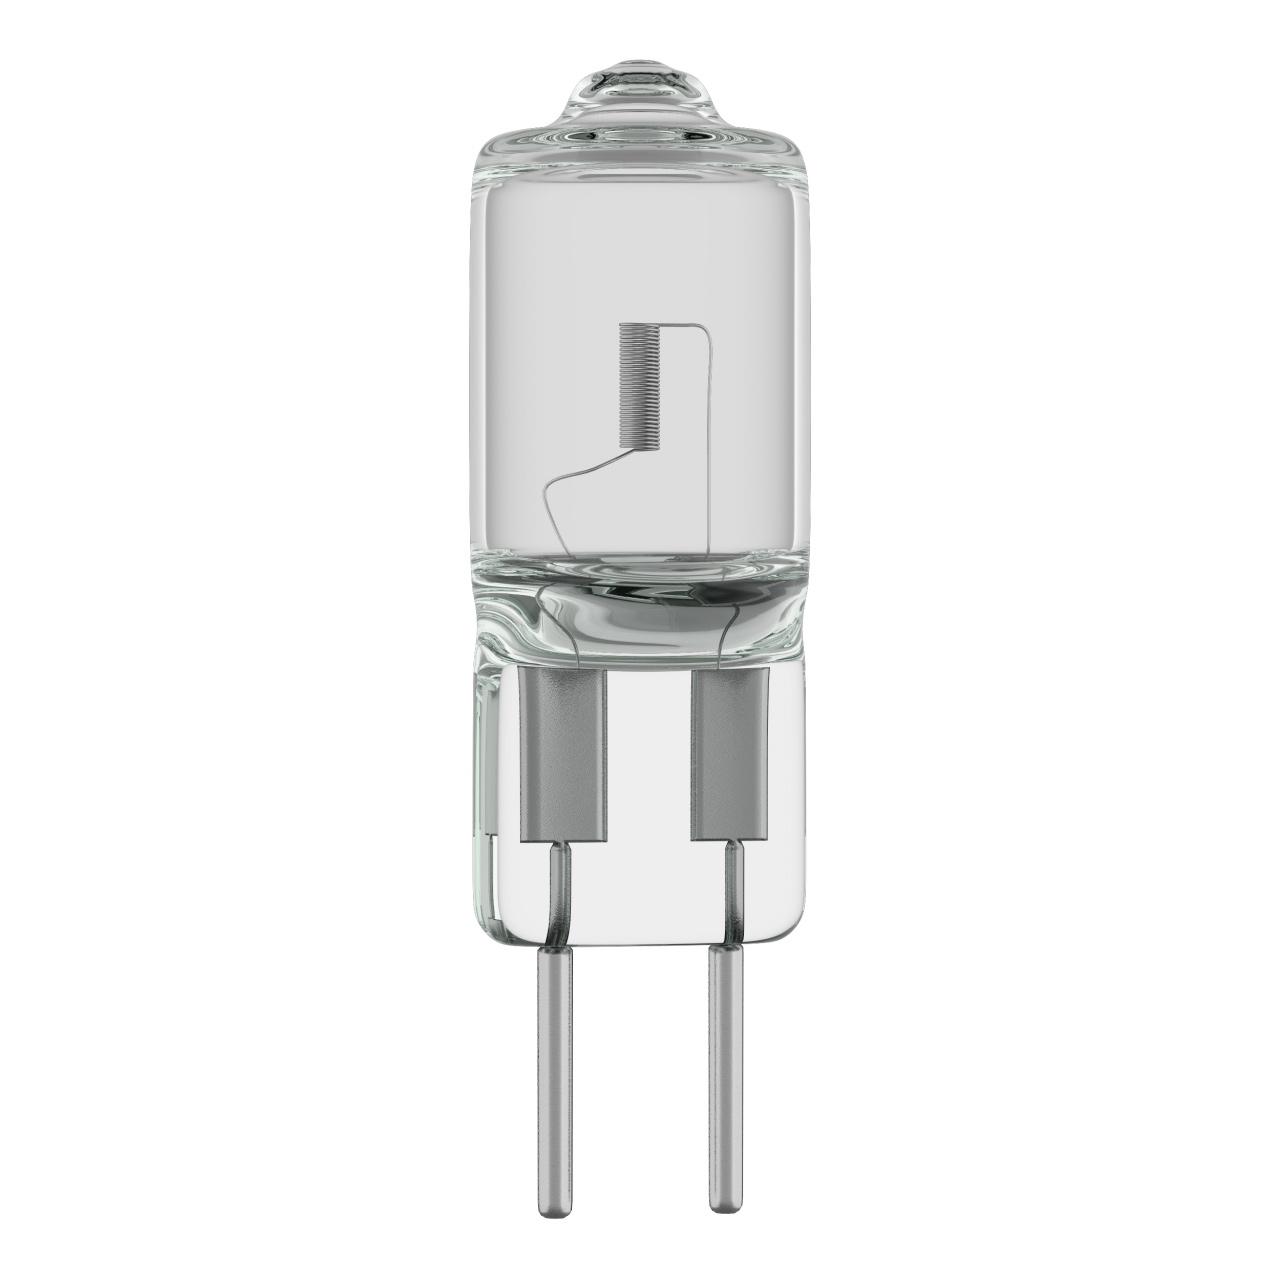 Лампа HAL 12V JC G5.3 50W RA100 2800K 2000H DIMM Lightstar 921029